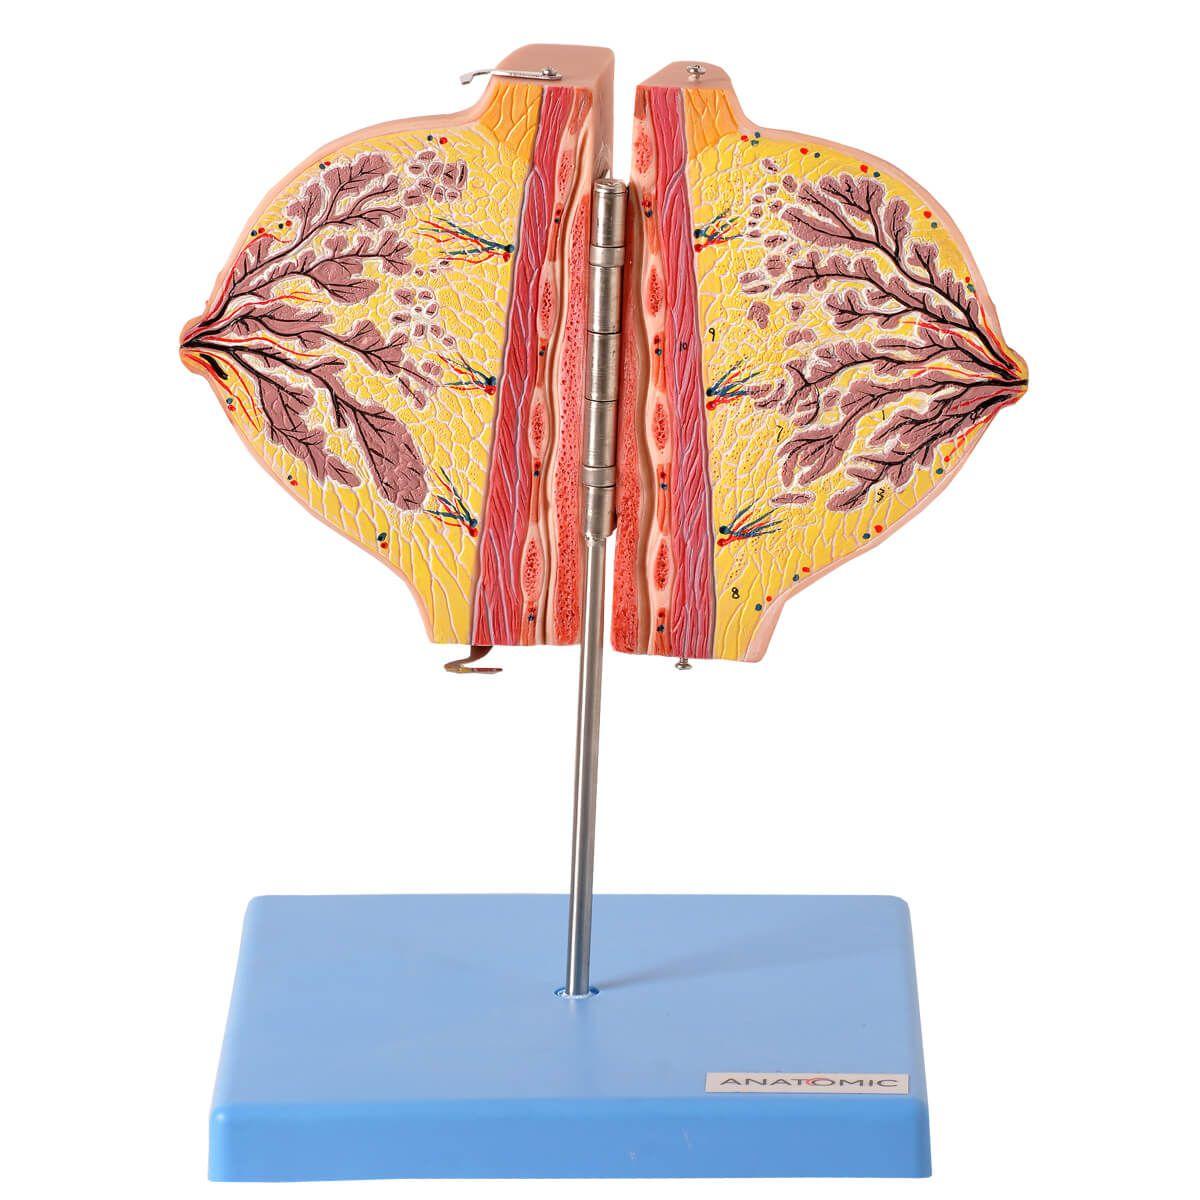 Modelo Anatomico Glândula Mamária No Período de Repouso